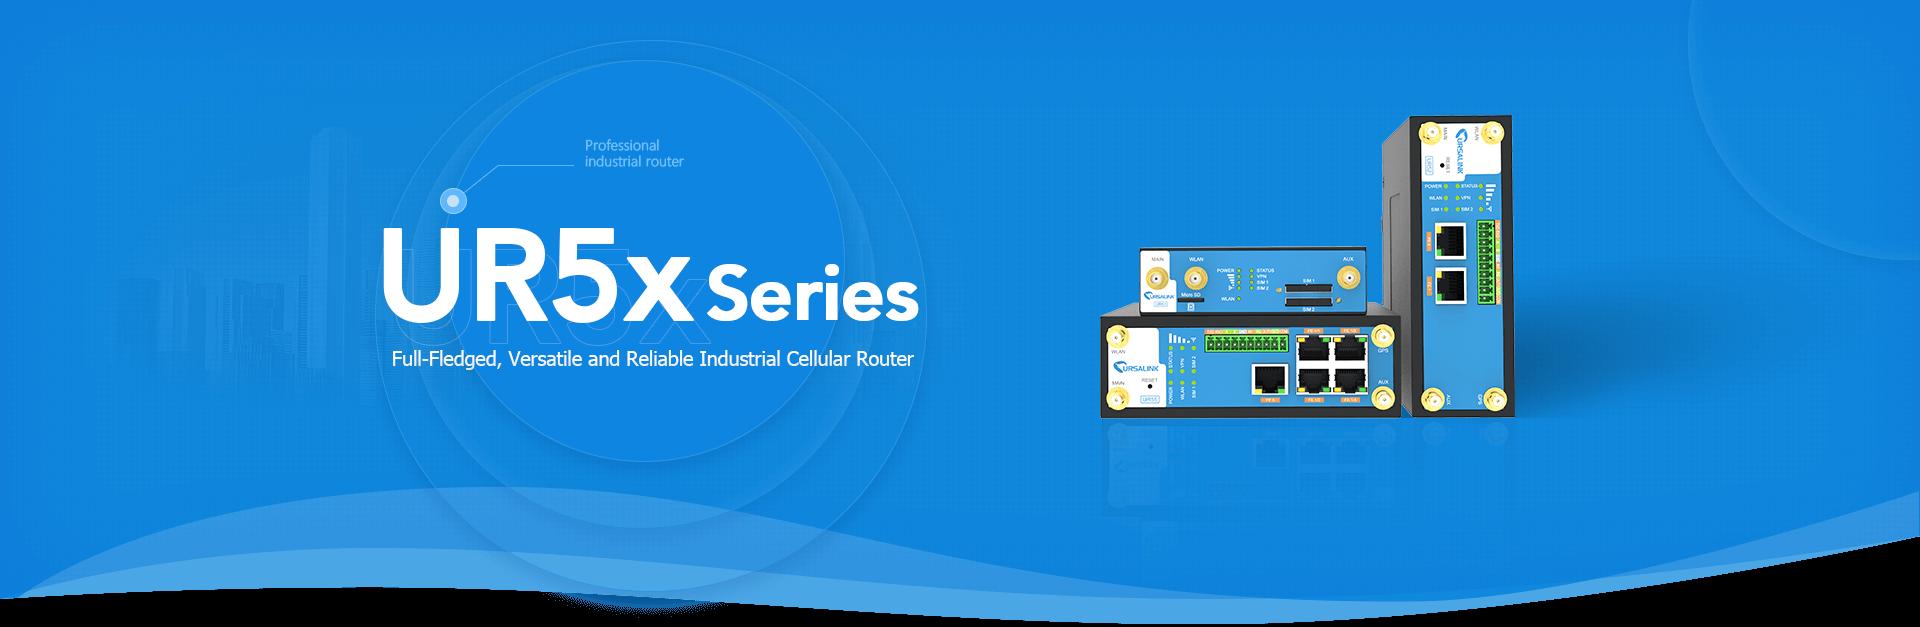 ur5x-series-comprehensive-industrial-interface